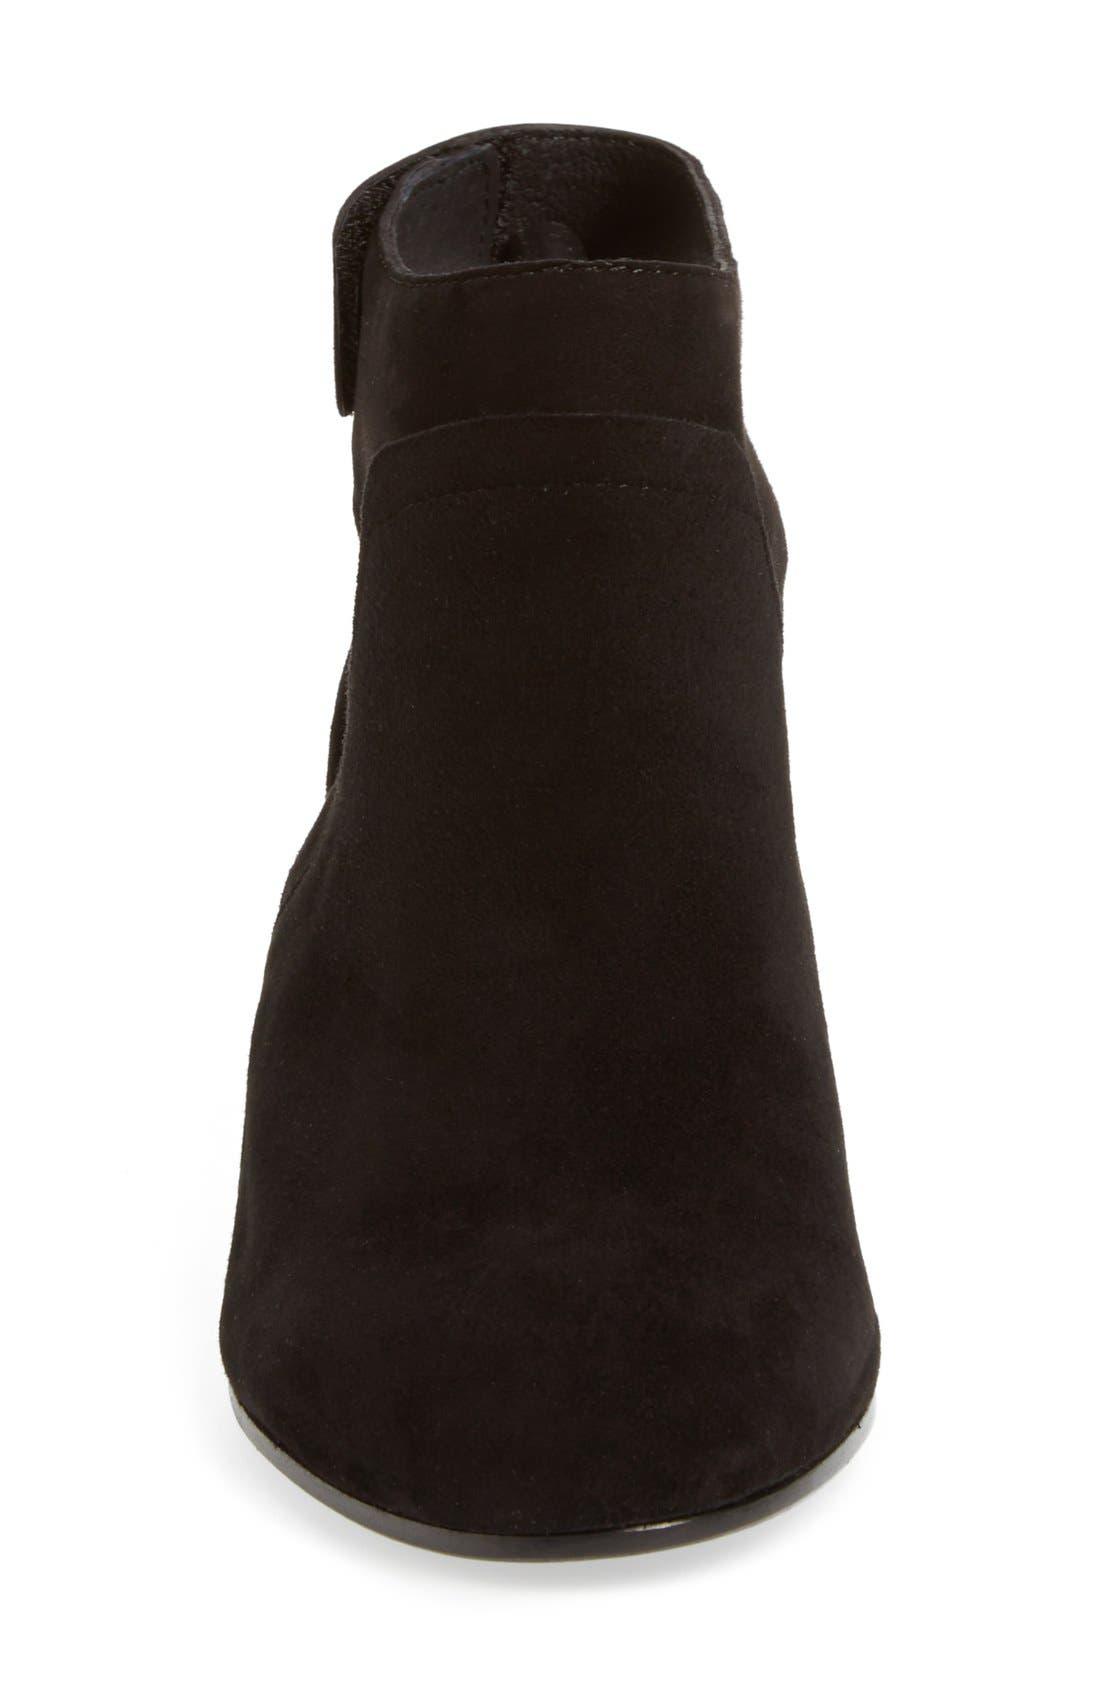 Alternate Image 3  - Eileen Fisher 'Ideal' Cutout Bootie (Women) (Online Only)